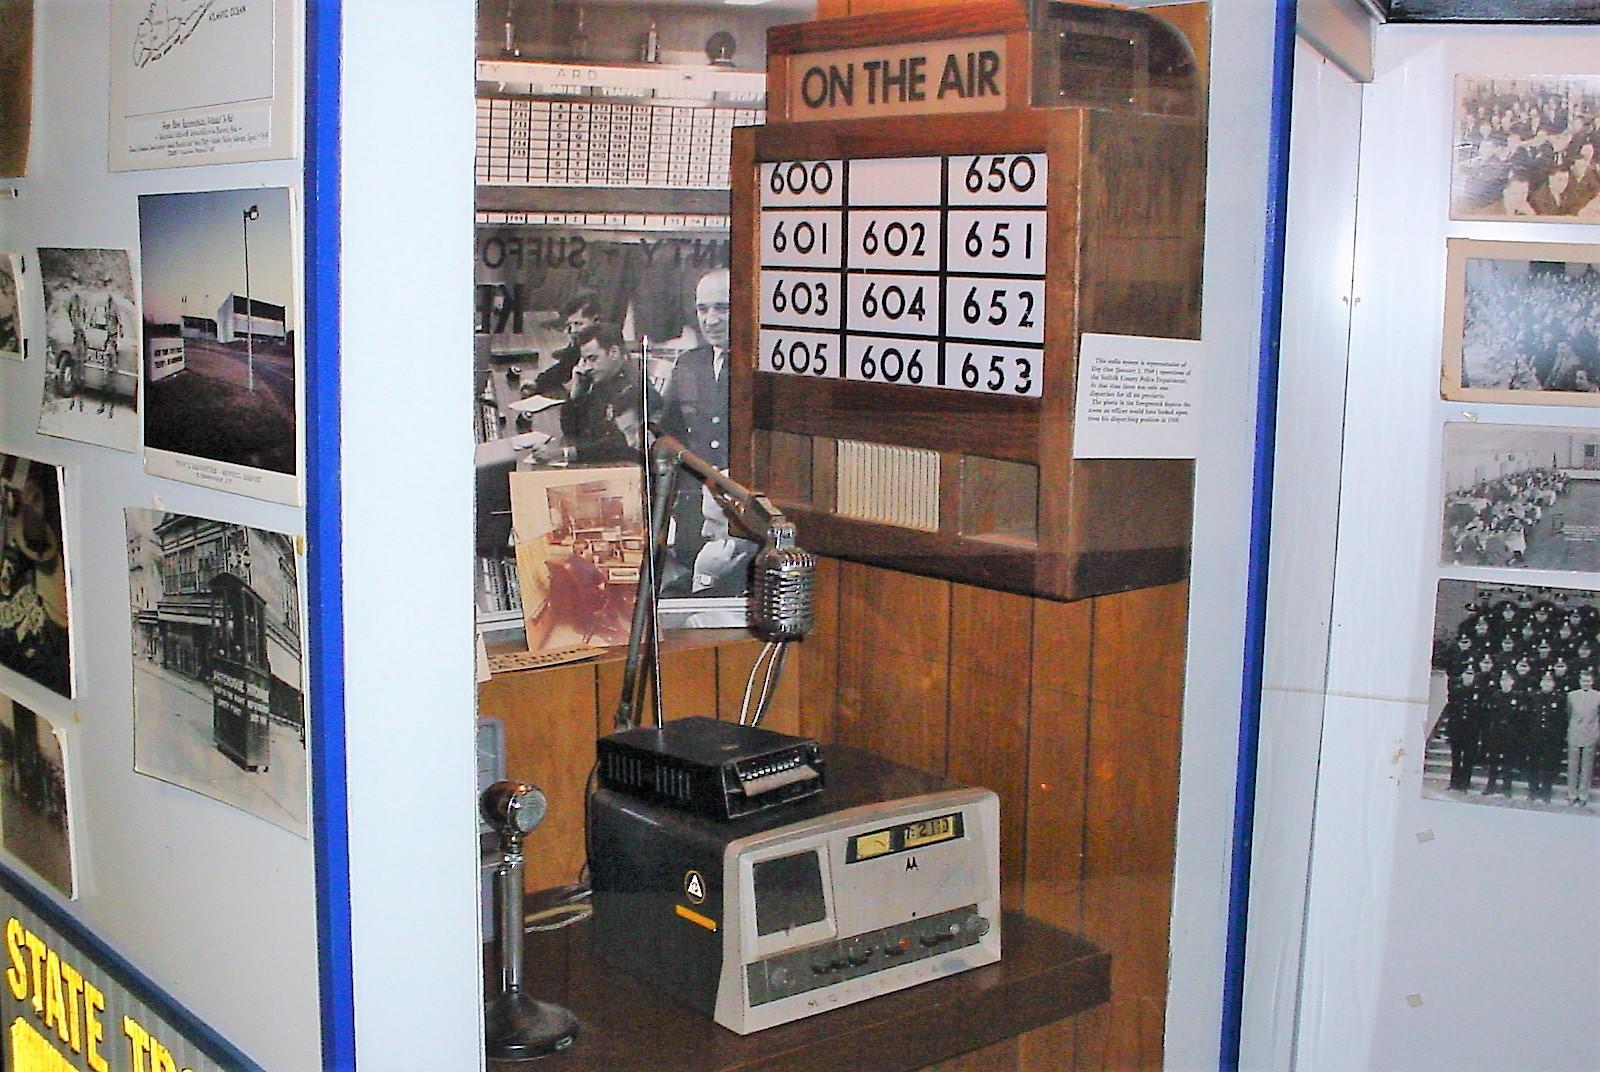 Old police radio